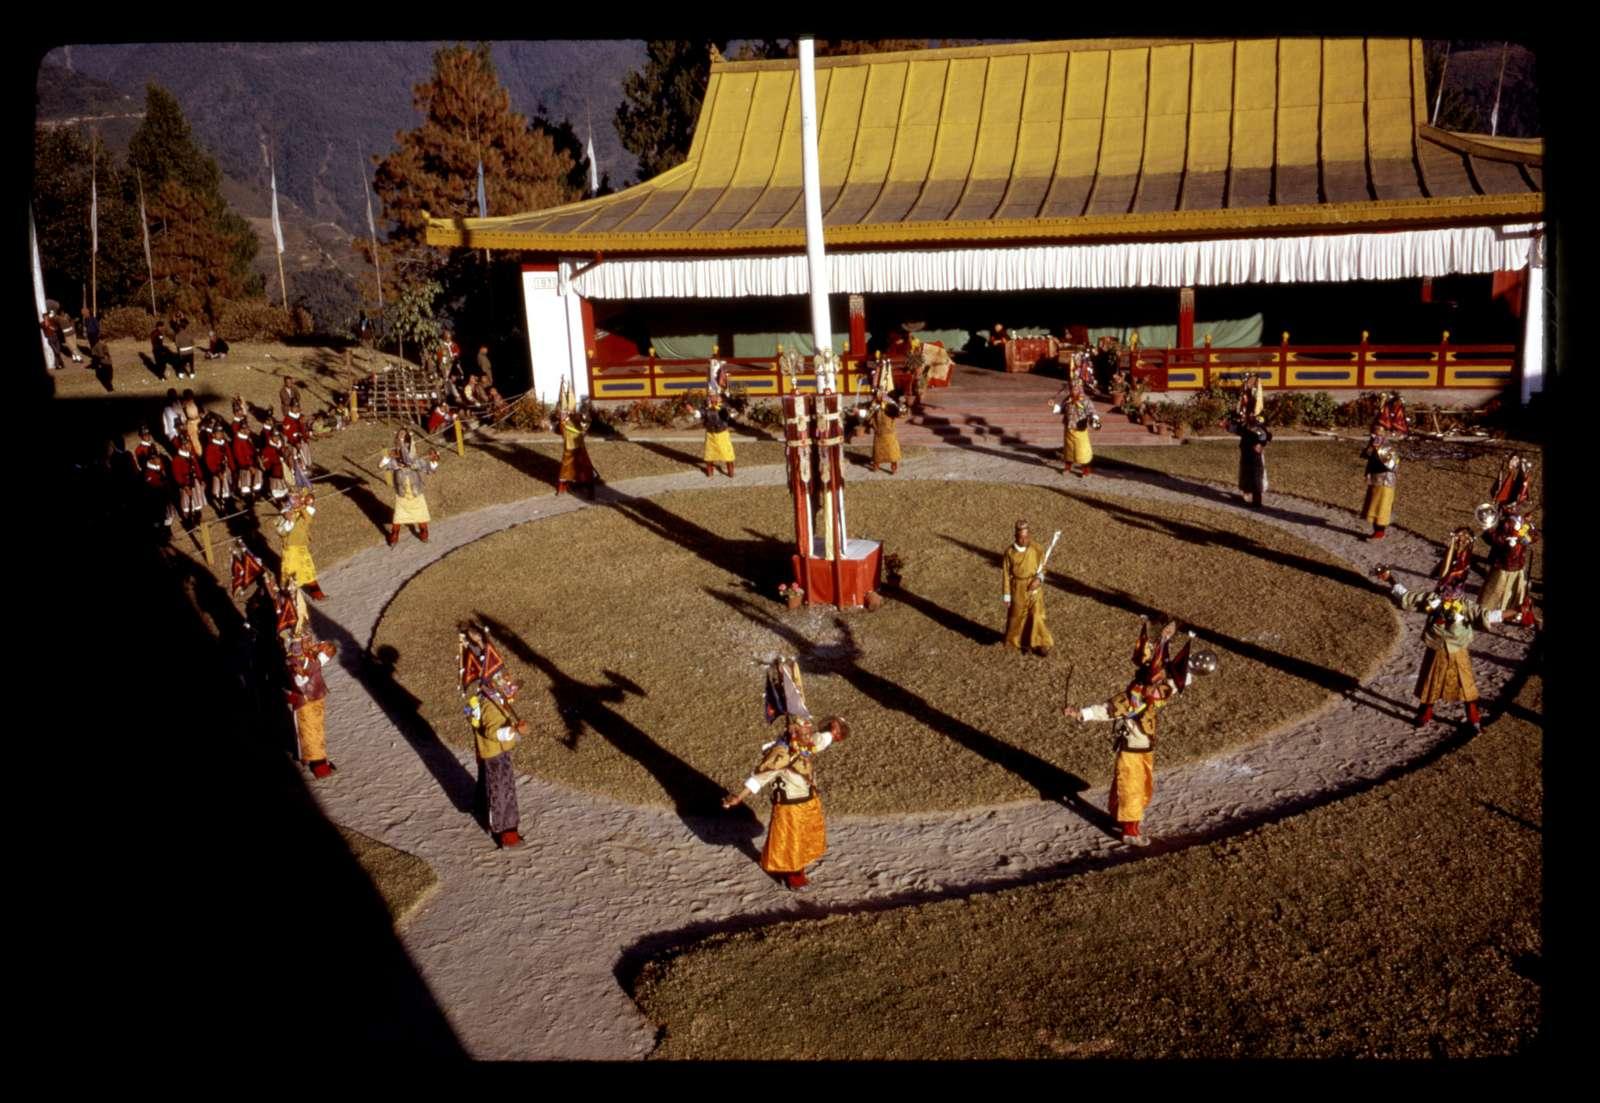 [Ceremonial warrior dance at New Year's event, Gangtok, Sikkim]